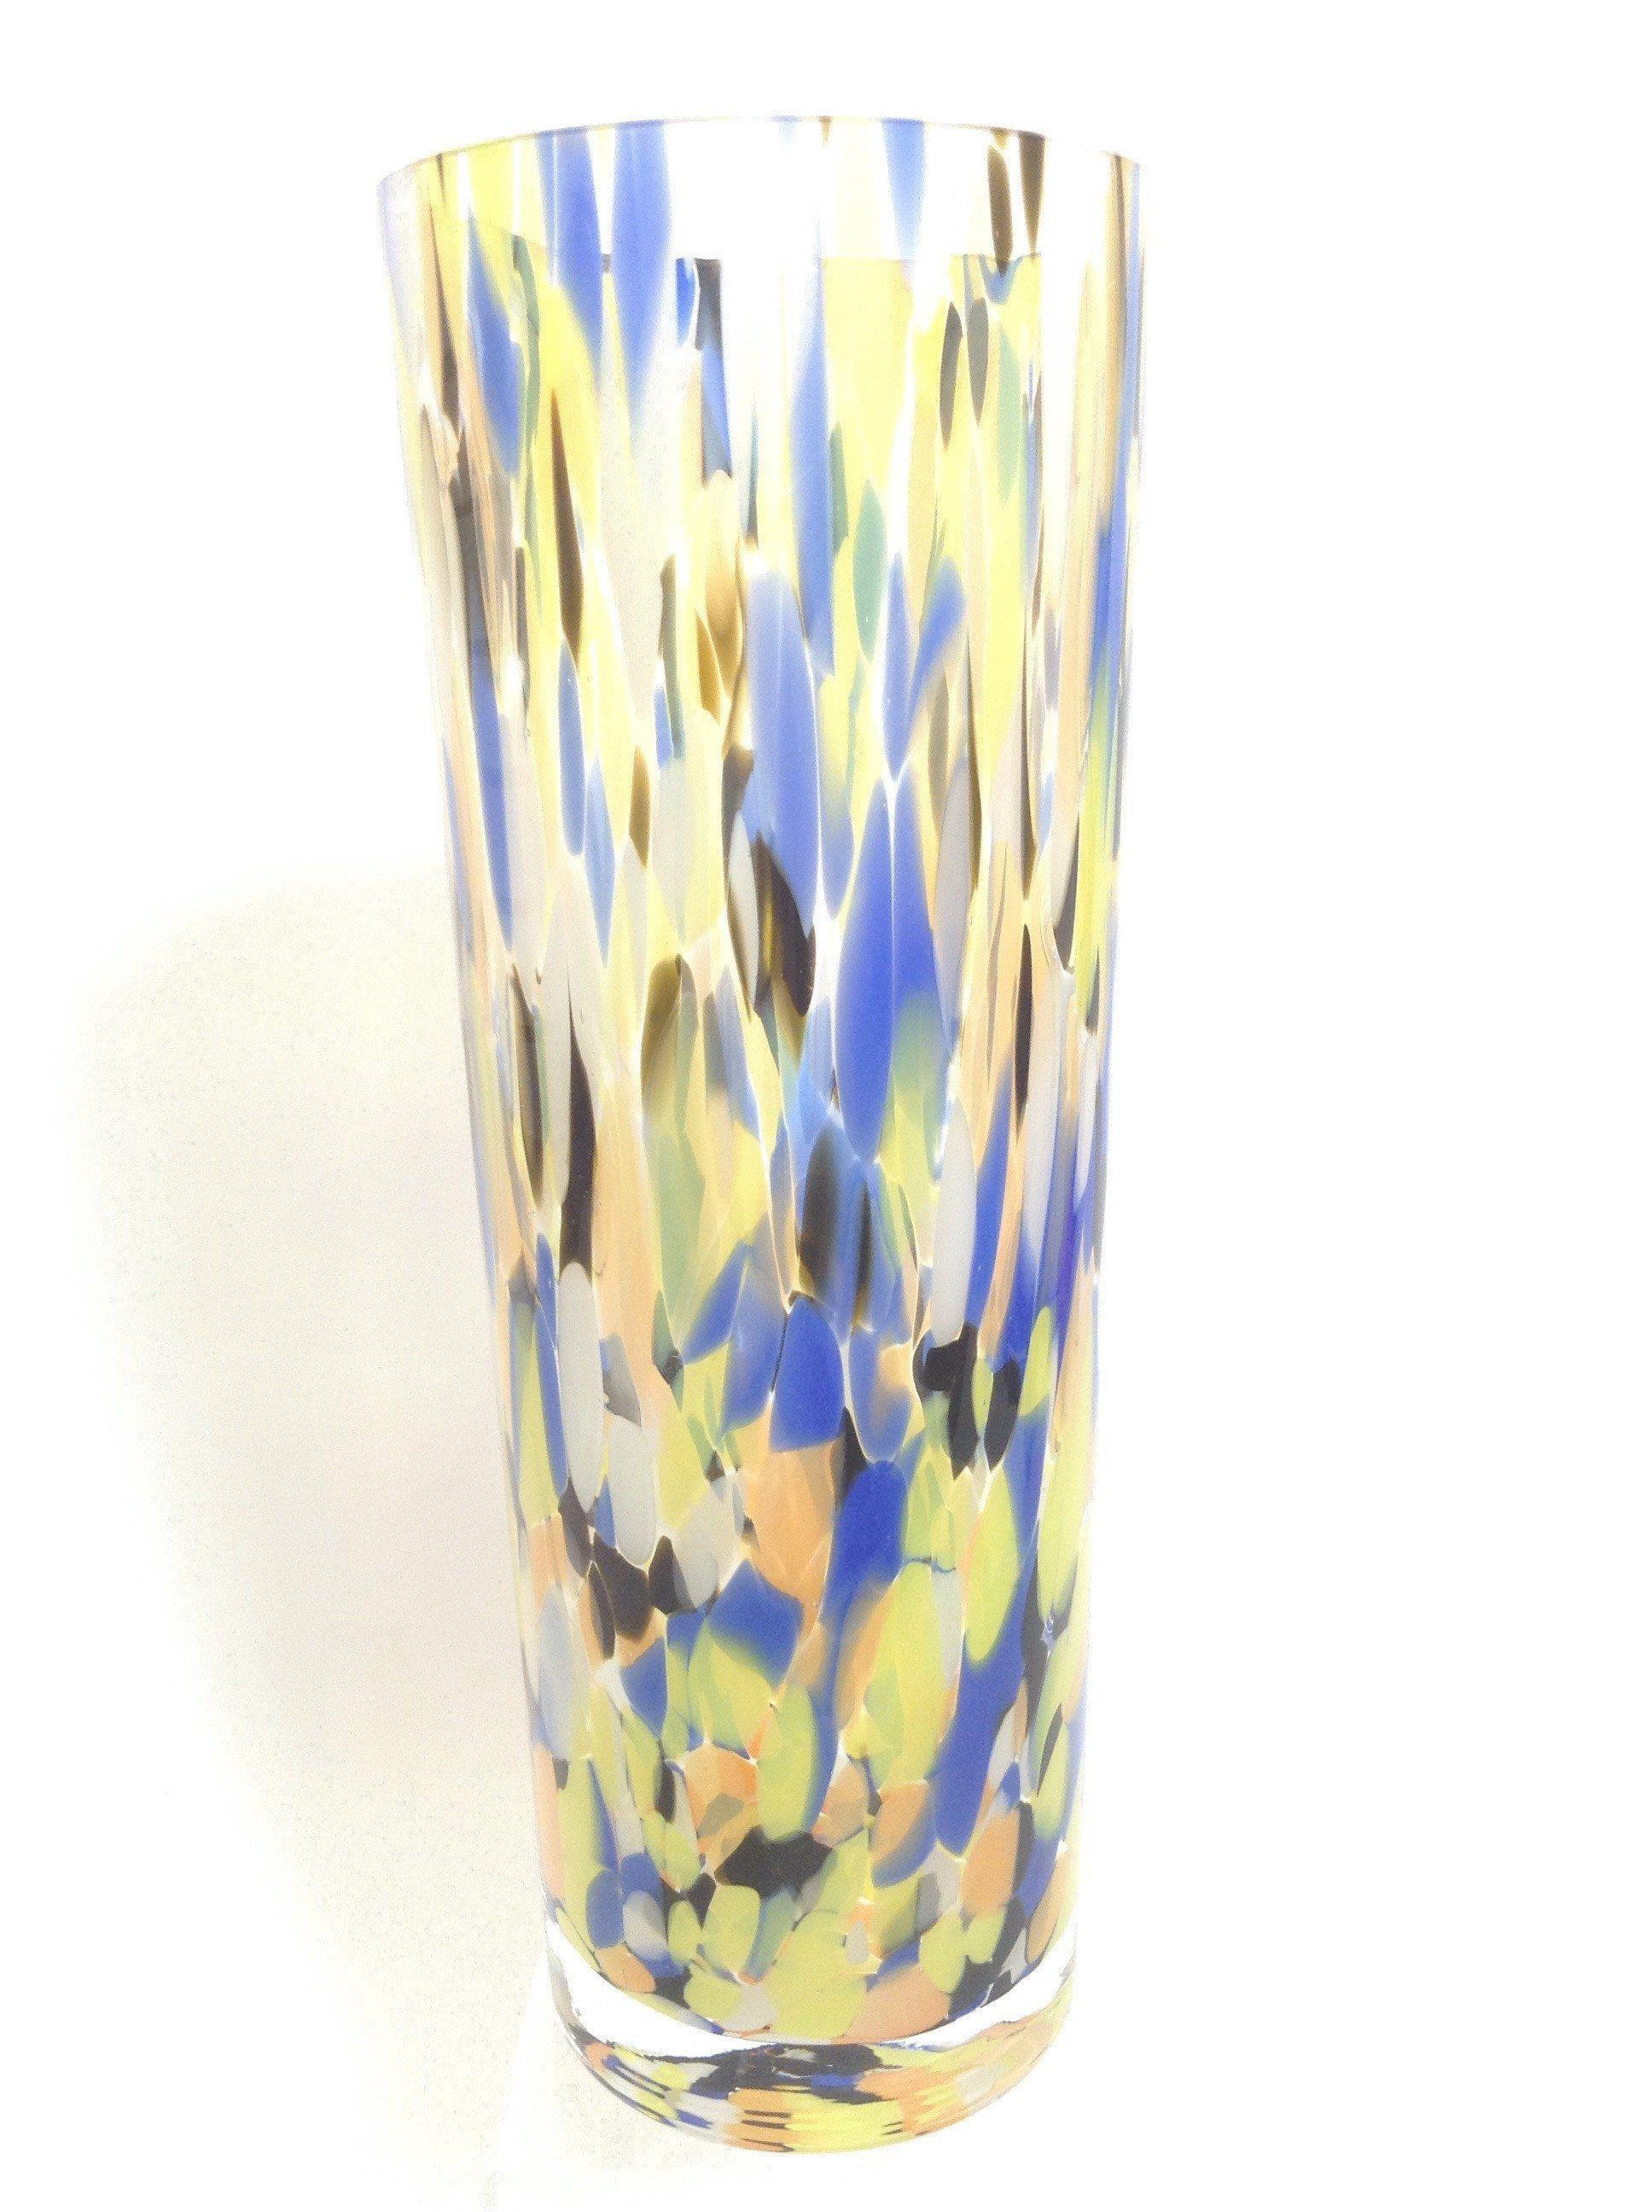 navy blue vase filler of pottery barn vases luxury yell blue blk glass vase products for pottery barn vases luxury yell blue blk glass vase products pinterest